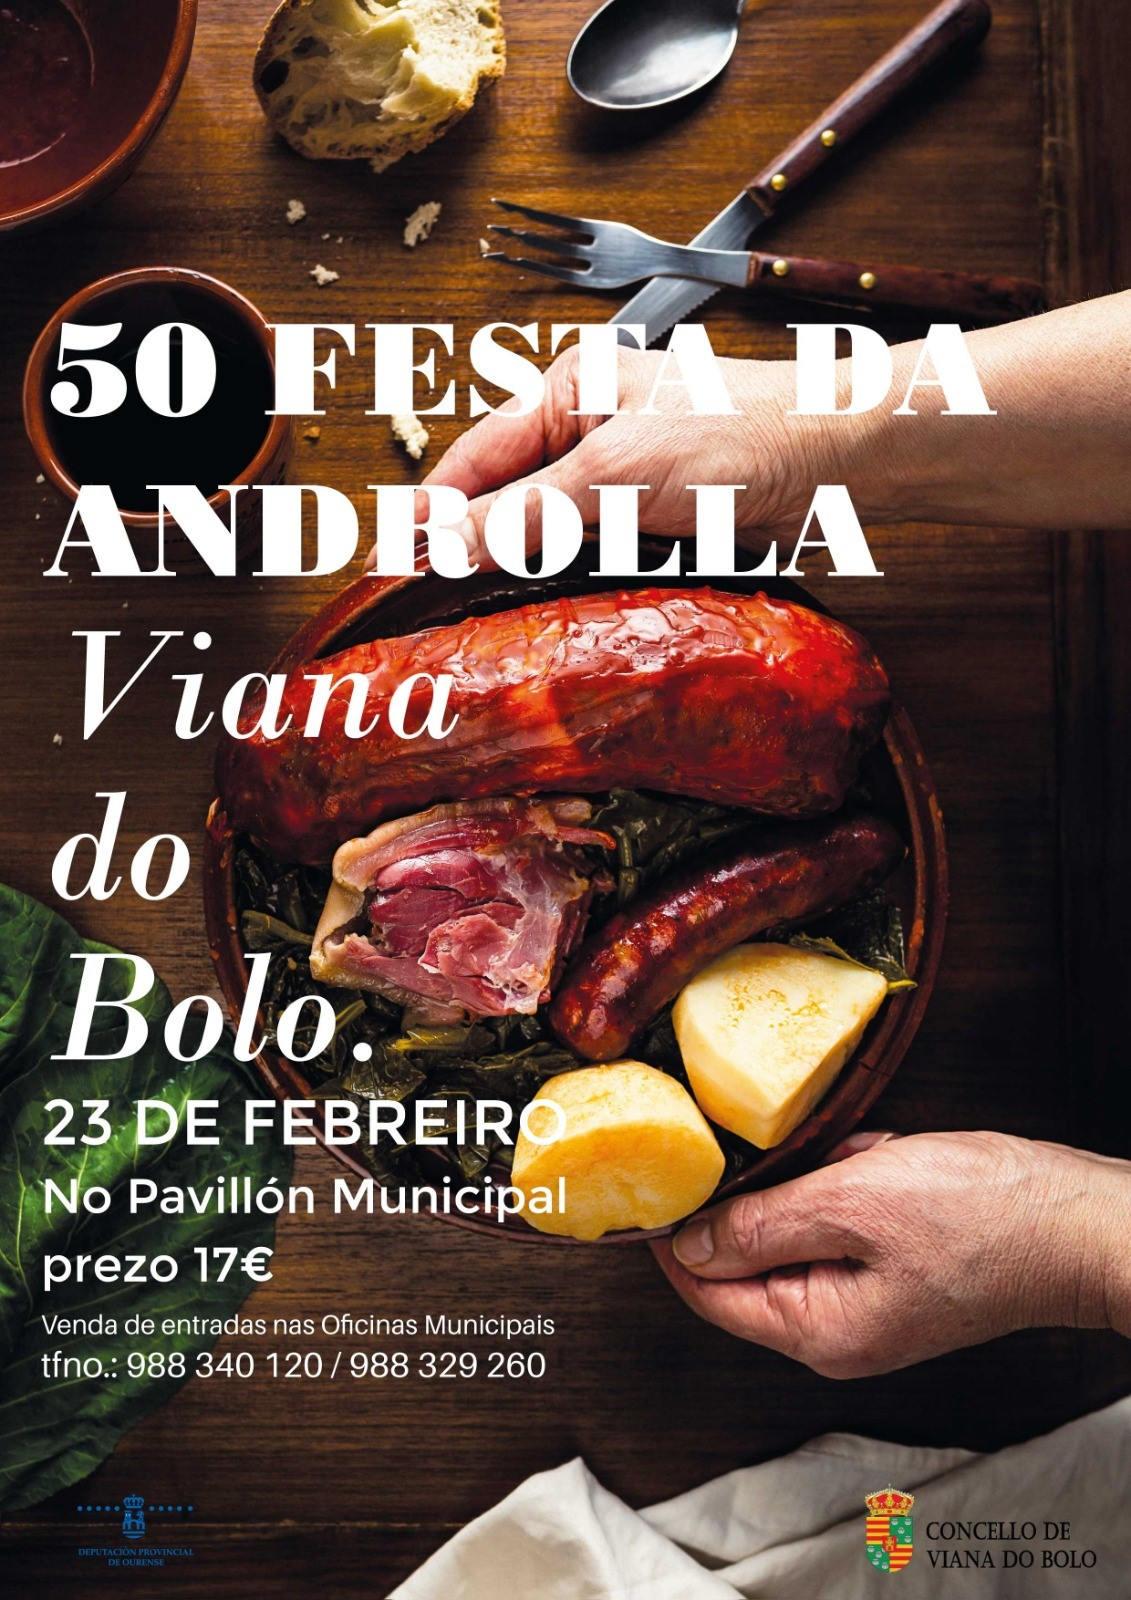 web CARTEL FESTA DA ANDROLLA 2020